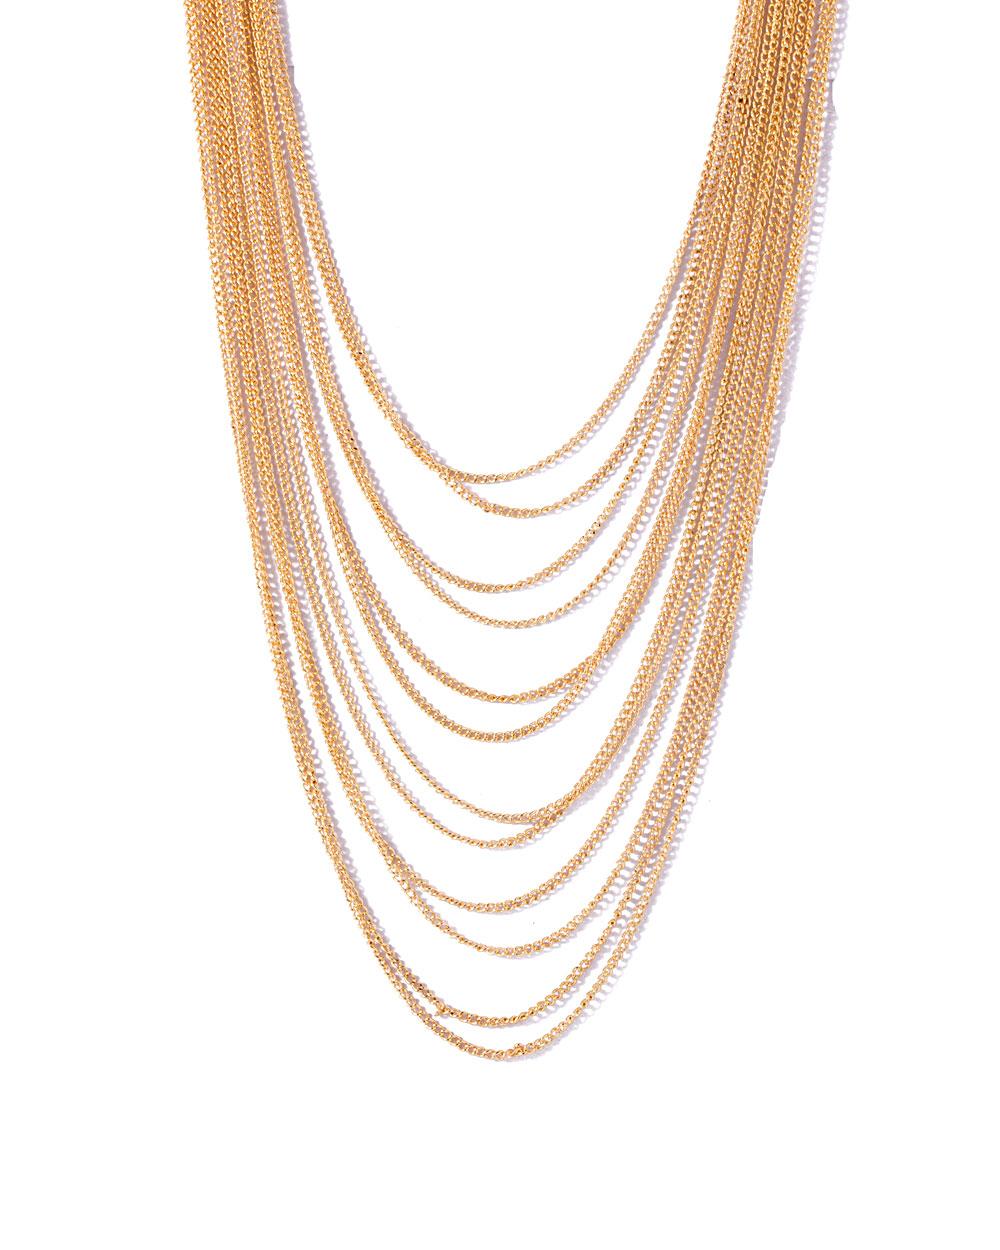 Buy Rani Haar Style Gold Tone Necklace Online India | Voylla